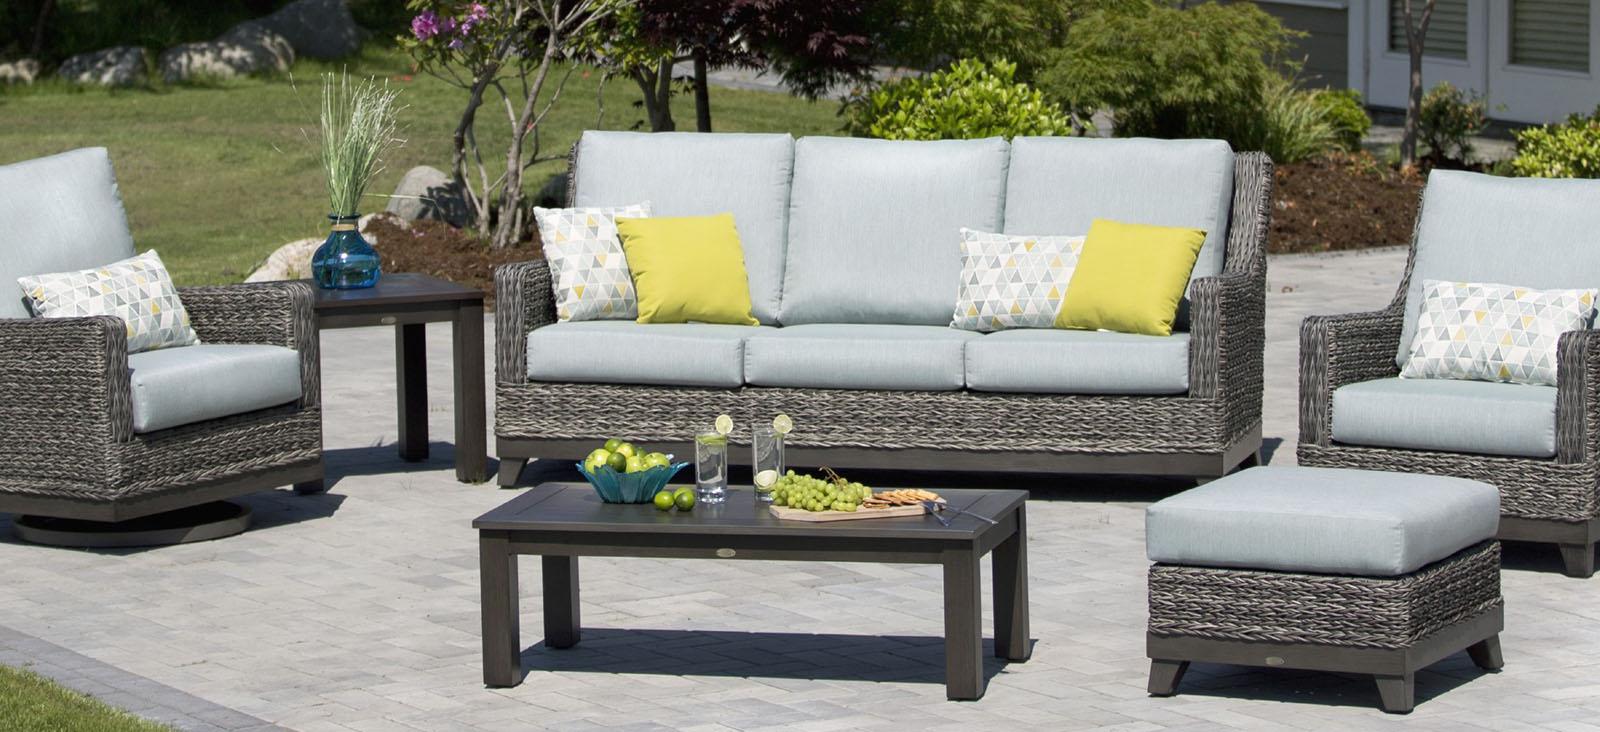 Outdoor Furniture Patio  Backyard Furniture Dallas Fort Worth - Ratana outdoor furniture